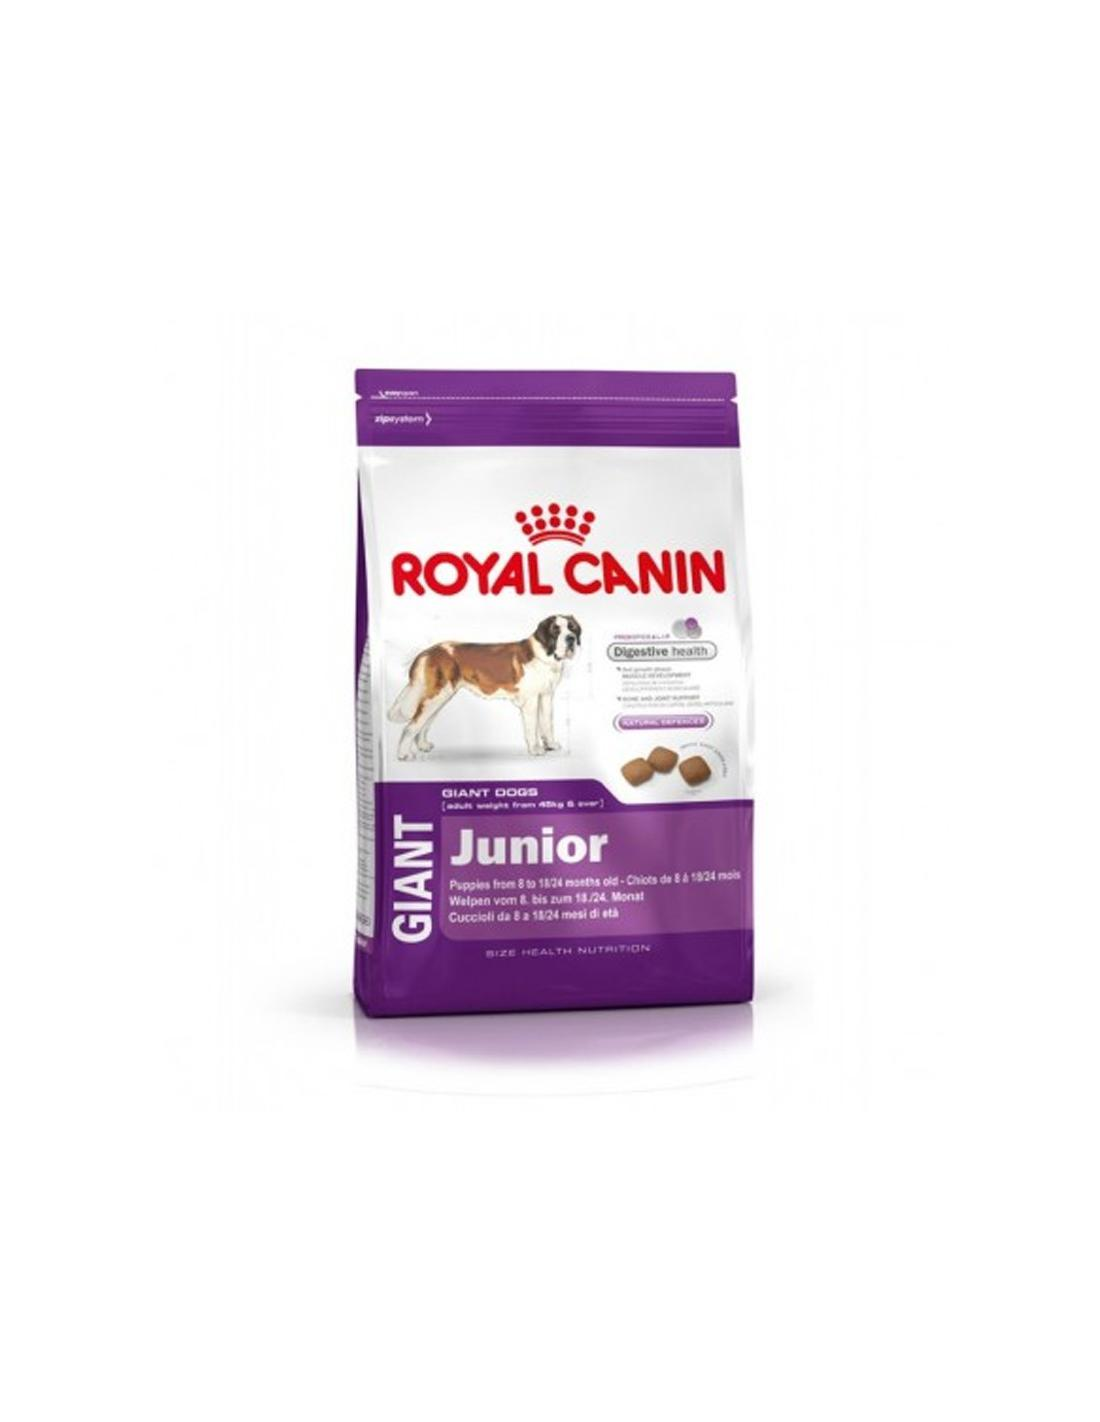 CROQUETTE ROYAL CANIN GIANT JUNIOR 15KG - 1